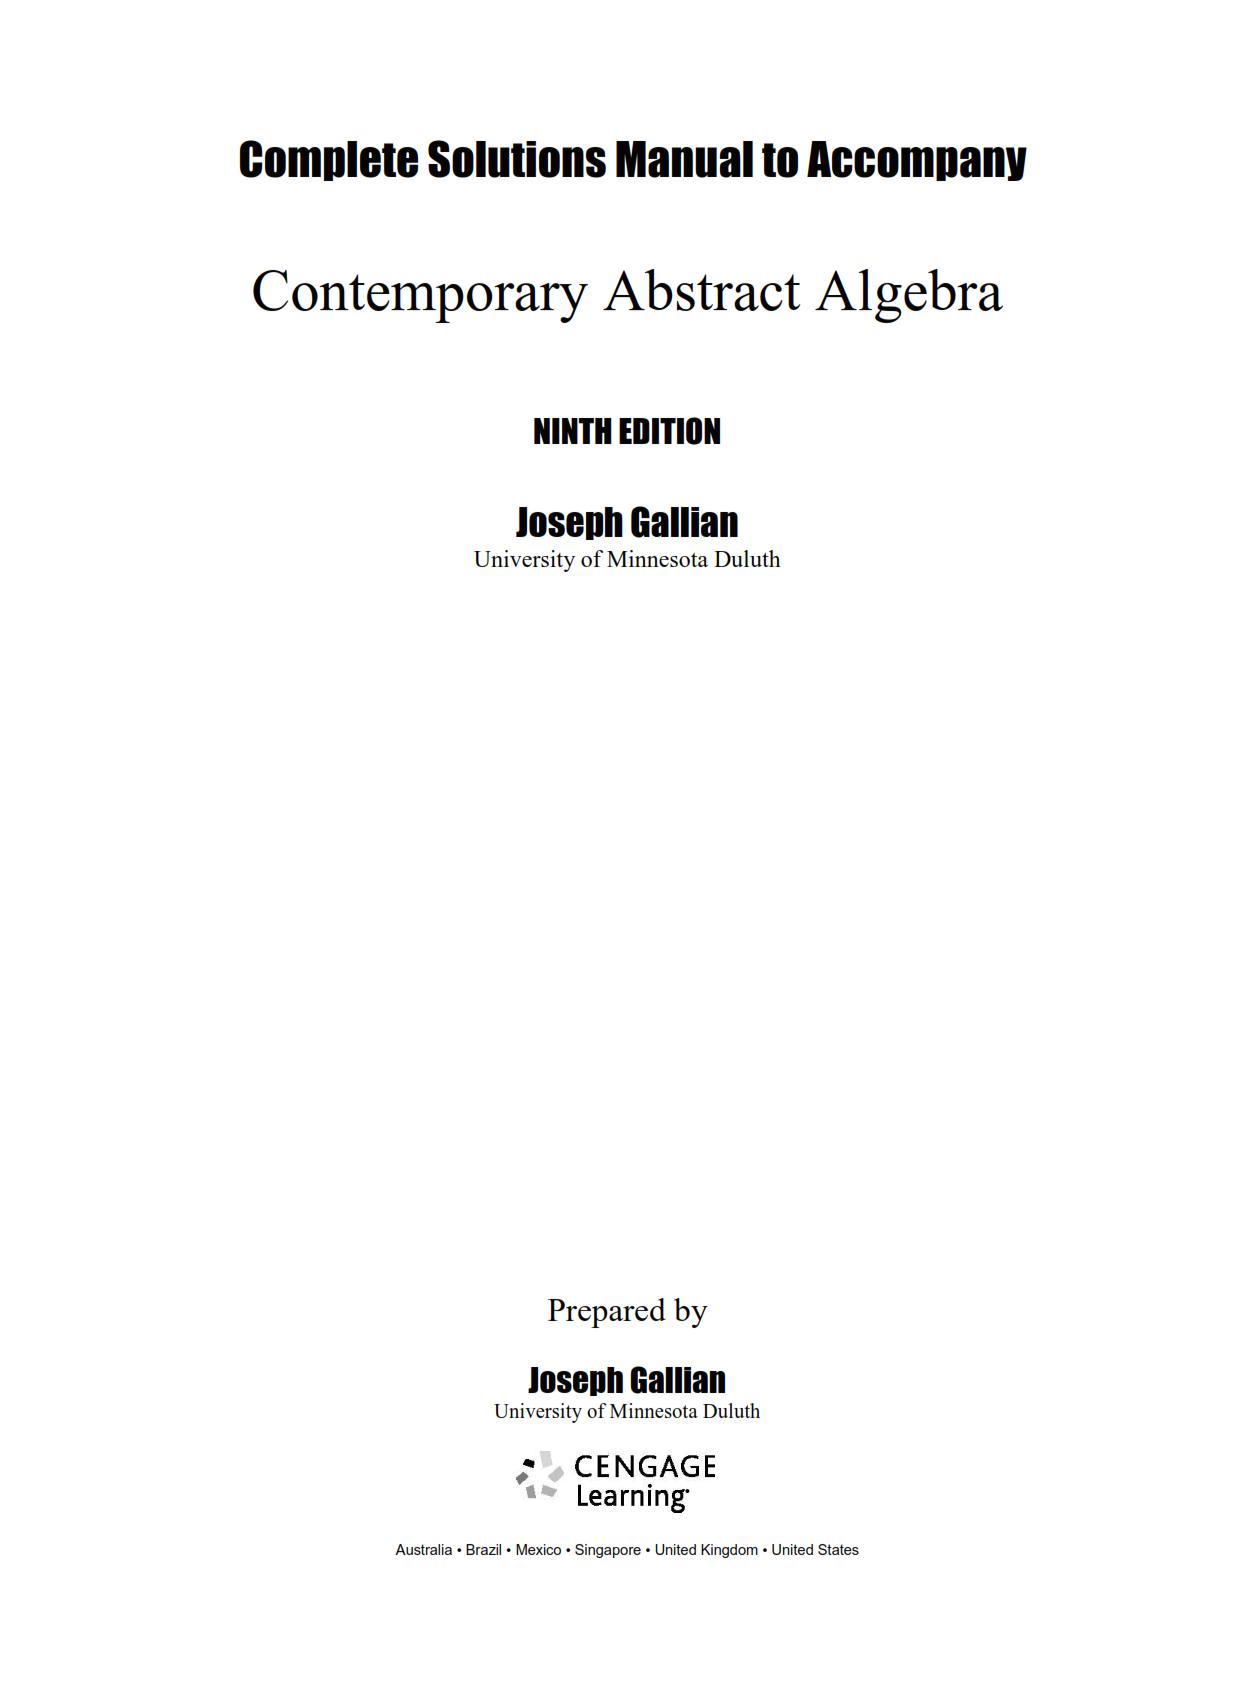 Contemporary Abstract Algebra 9th Edition Pdf